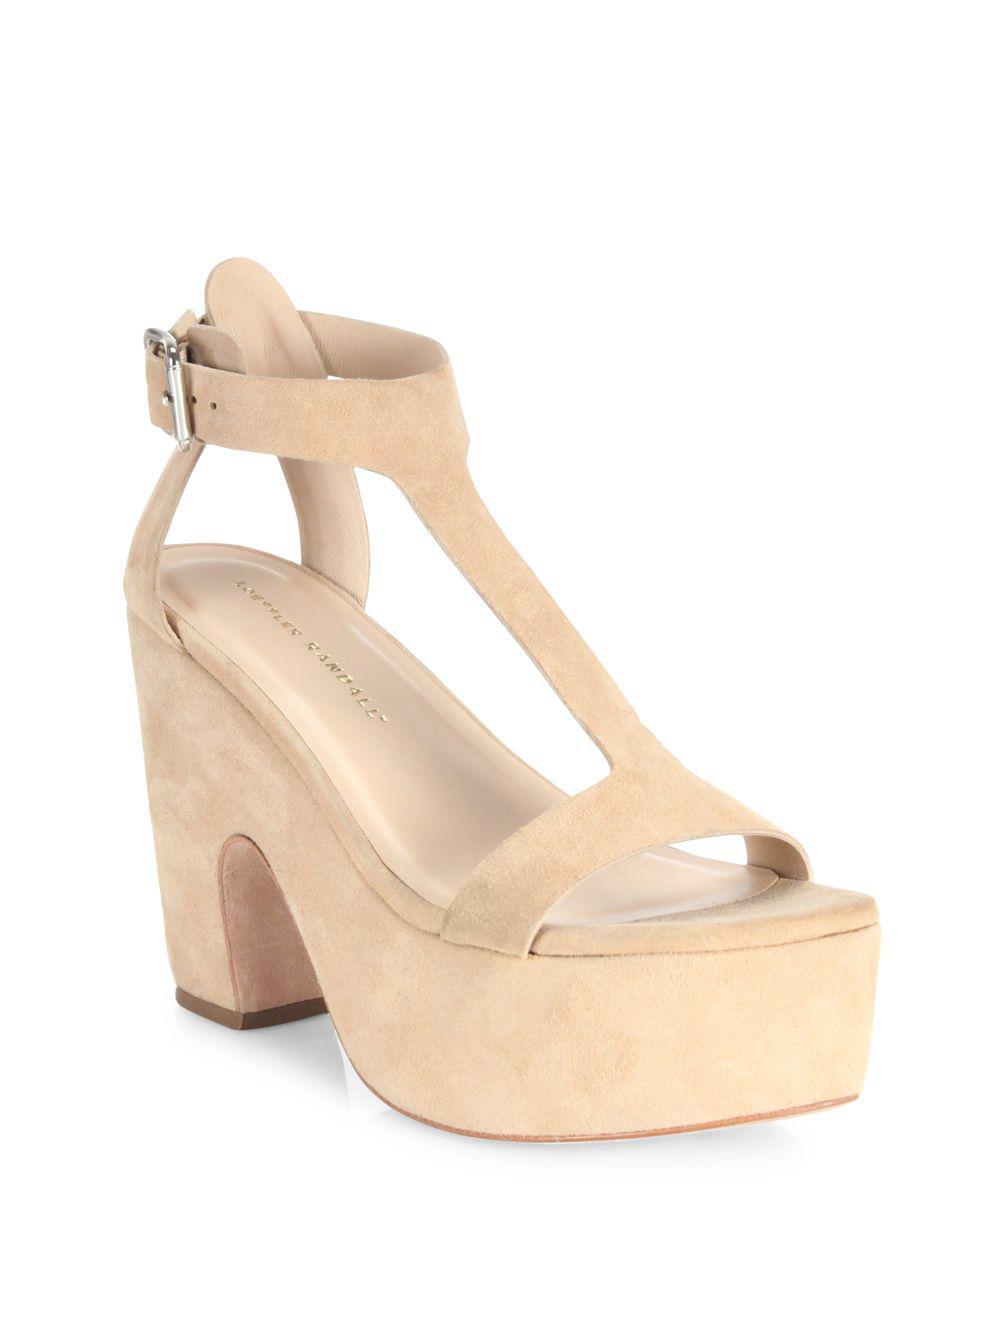 6f0384e3f271 Lyst - Loeffler Randall Minette Suede Platform Wedge Sandals in Natural